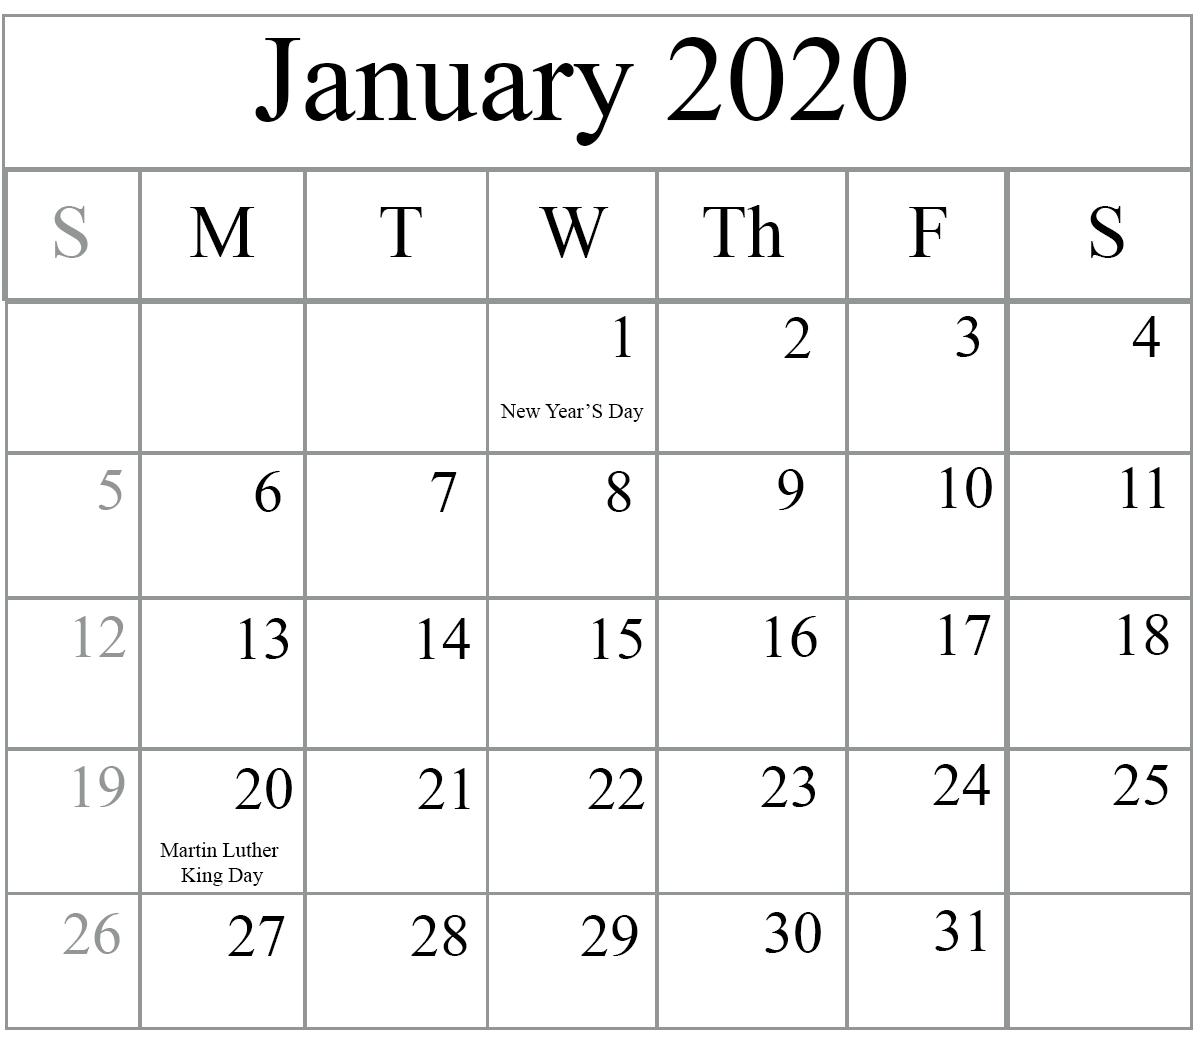 January 2020 Printable Calendar Canada With Holidays